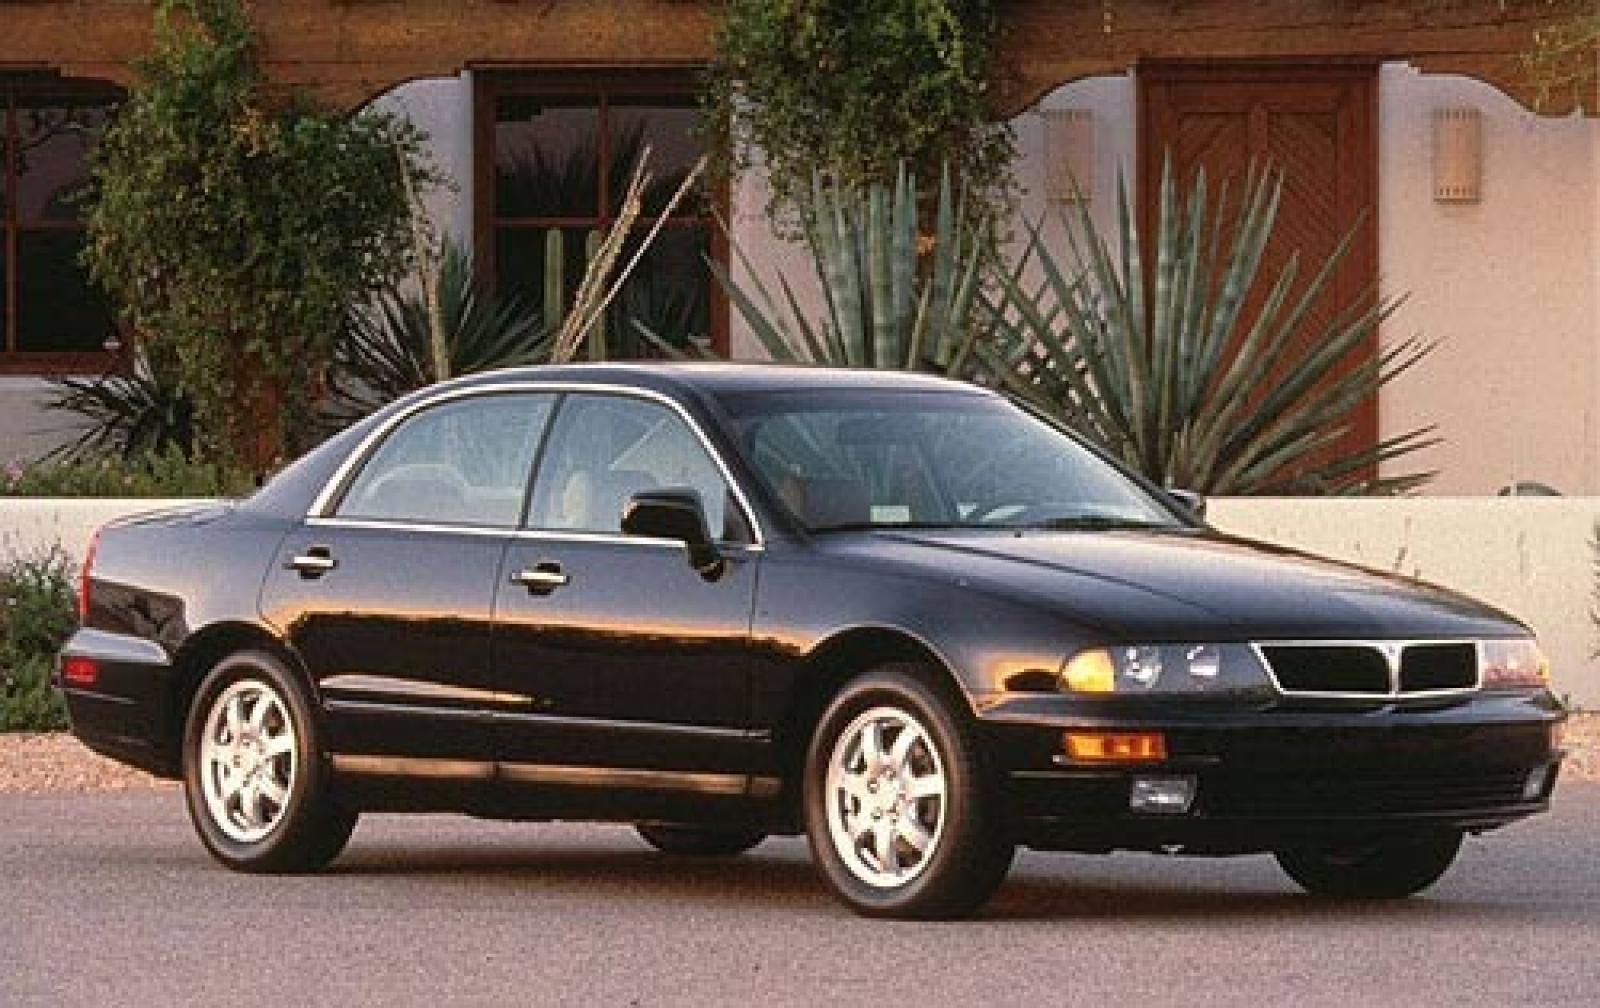 1998 Mitsubishi Diamante #1 800 1024 1280 1600 origin